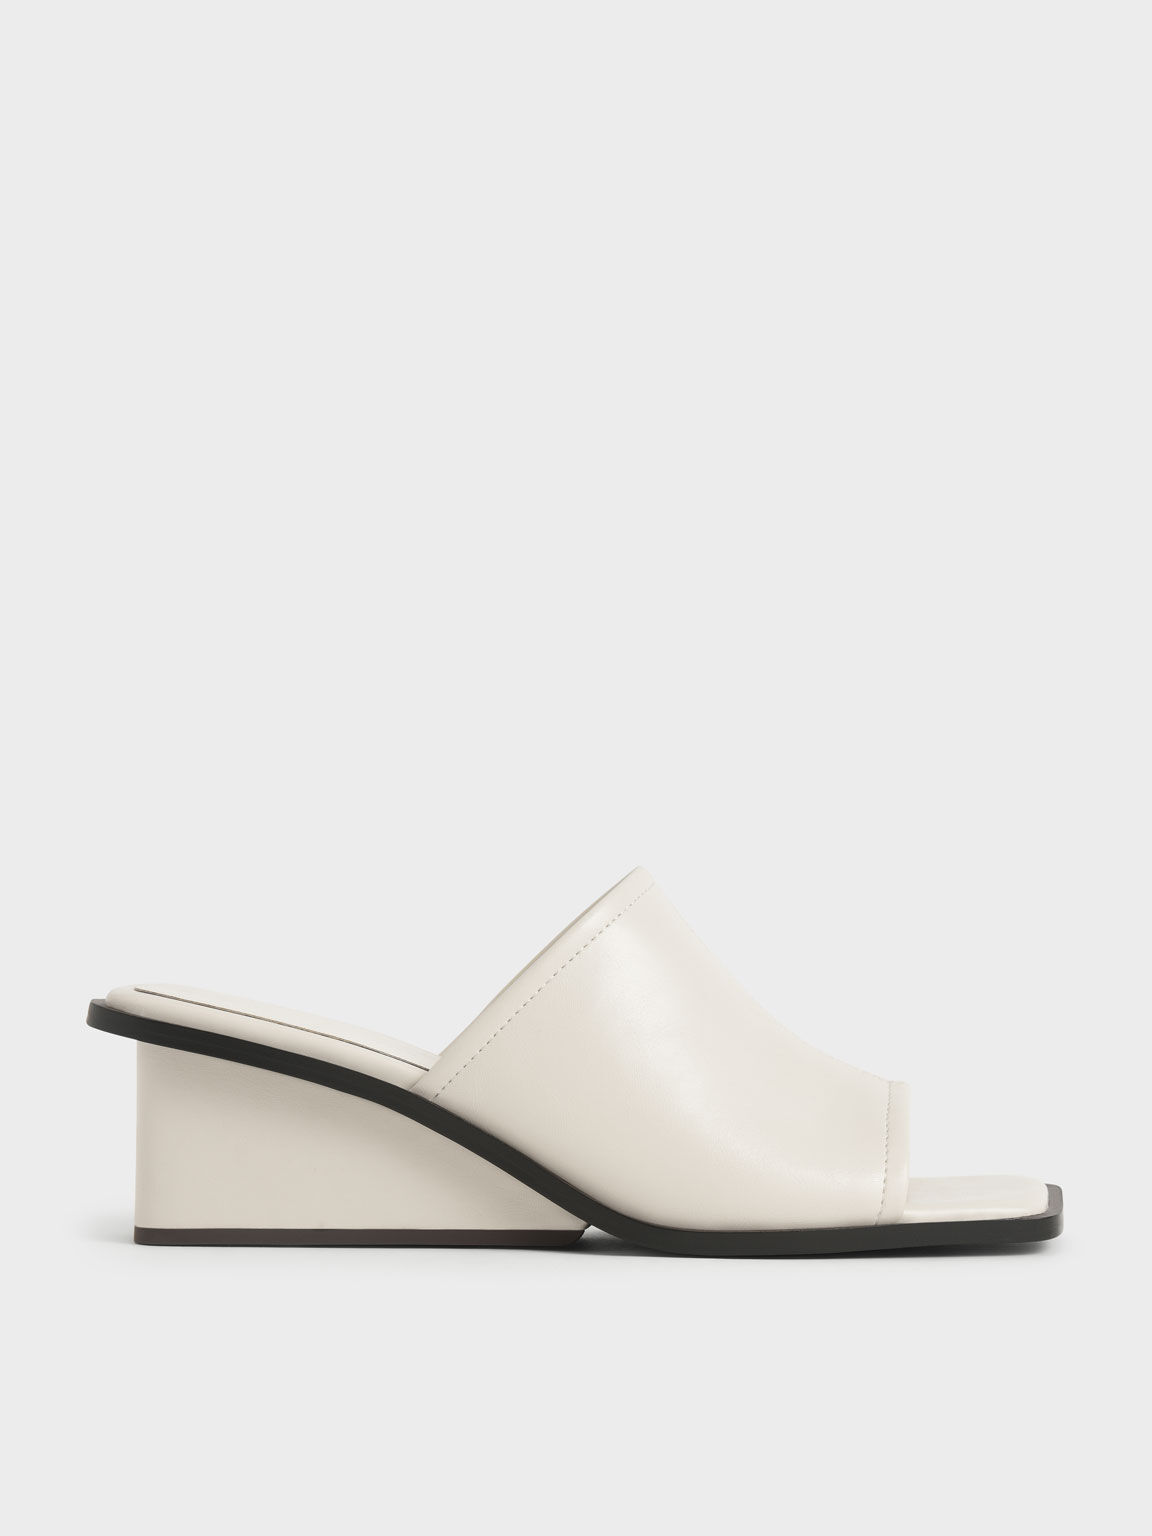 Sandal Square Toe Wedge Mules, Chalk, hi-res